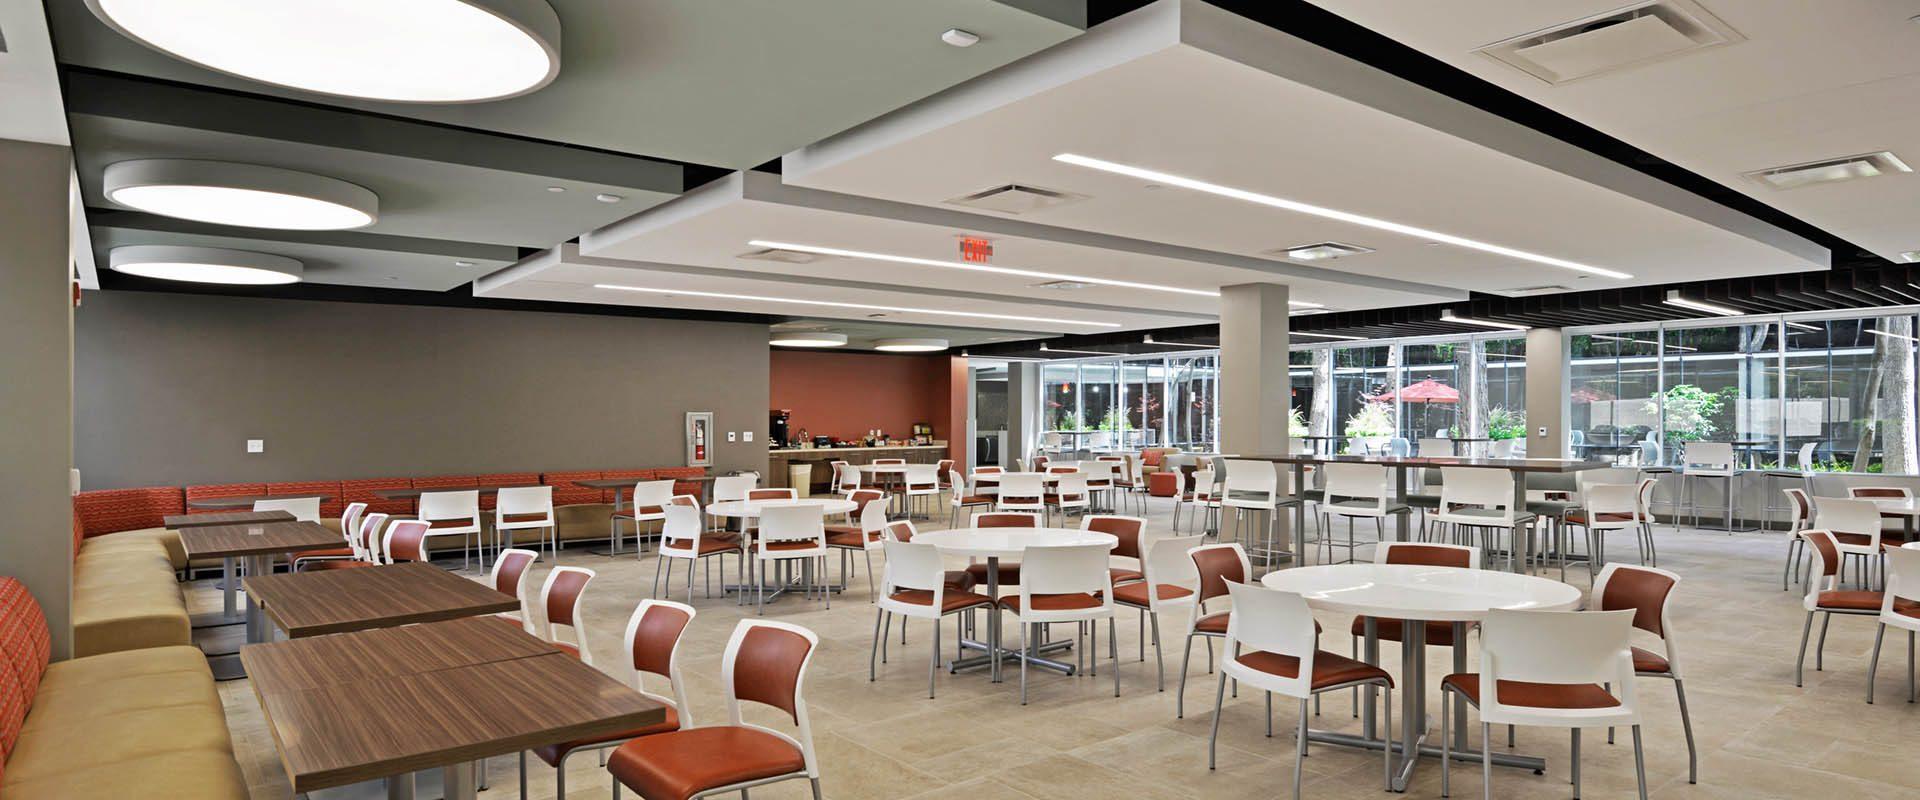 TheSalvationArmy-TexasDivisionalHeadquarters-Interior-Dining